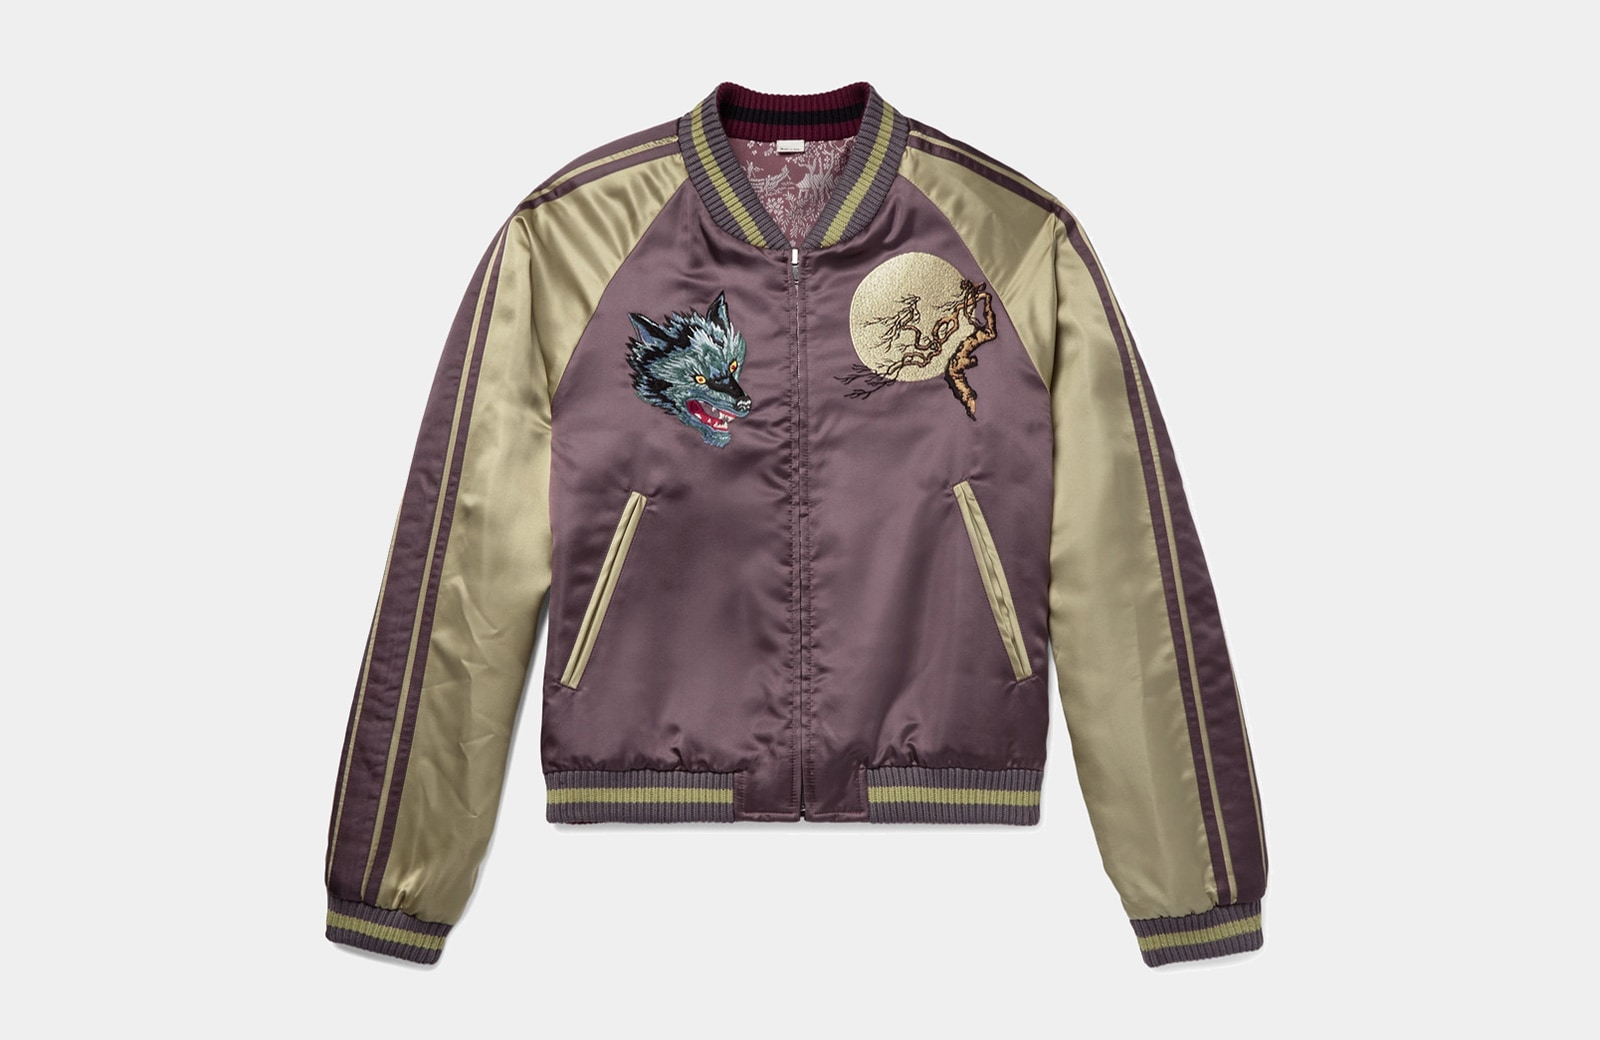 best Japanese bomber jacket men Gucci luxury style - Luxe Digital